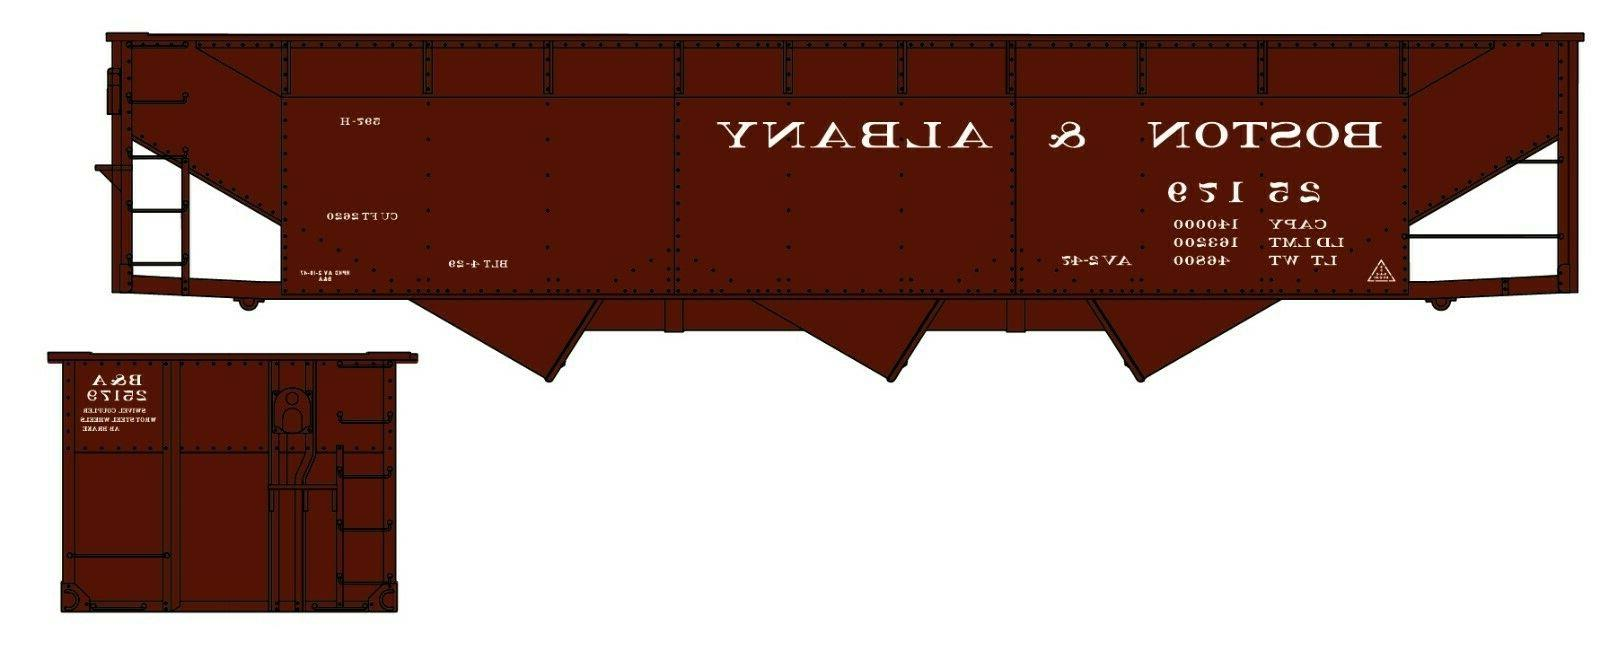 H0 -70-Ton Offset Triple - Bostom & Albany RR -